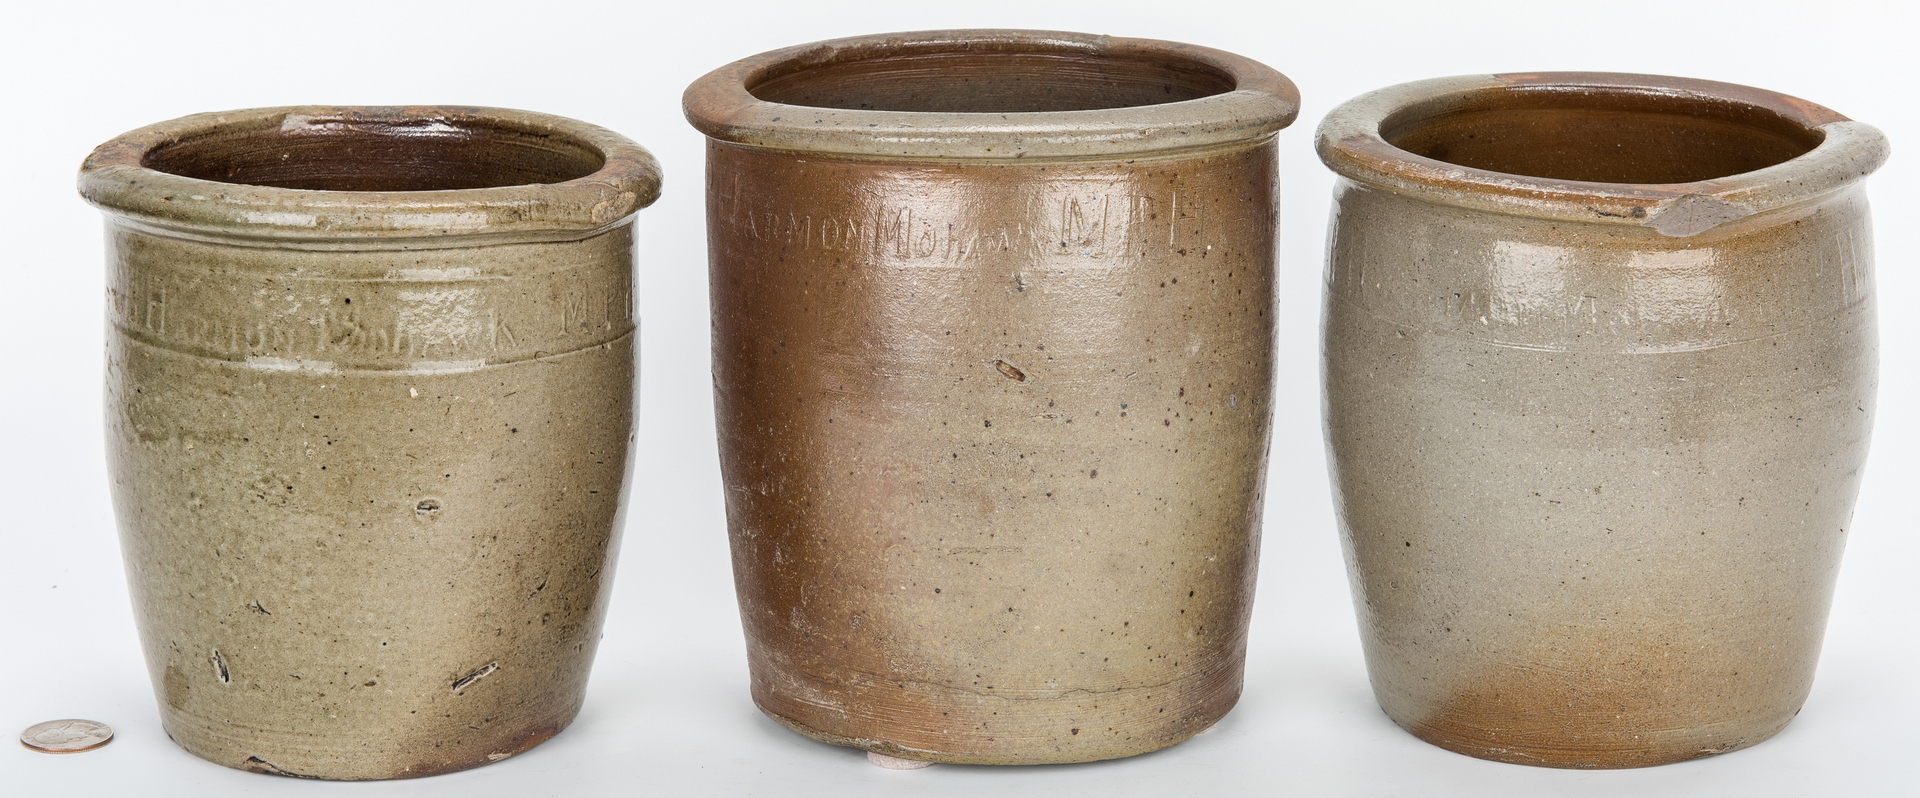 Lot 170: 3 East TN M. P. Harmon Stoneware Jars